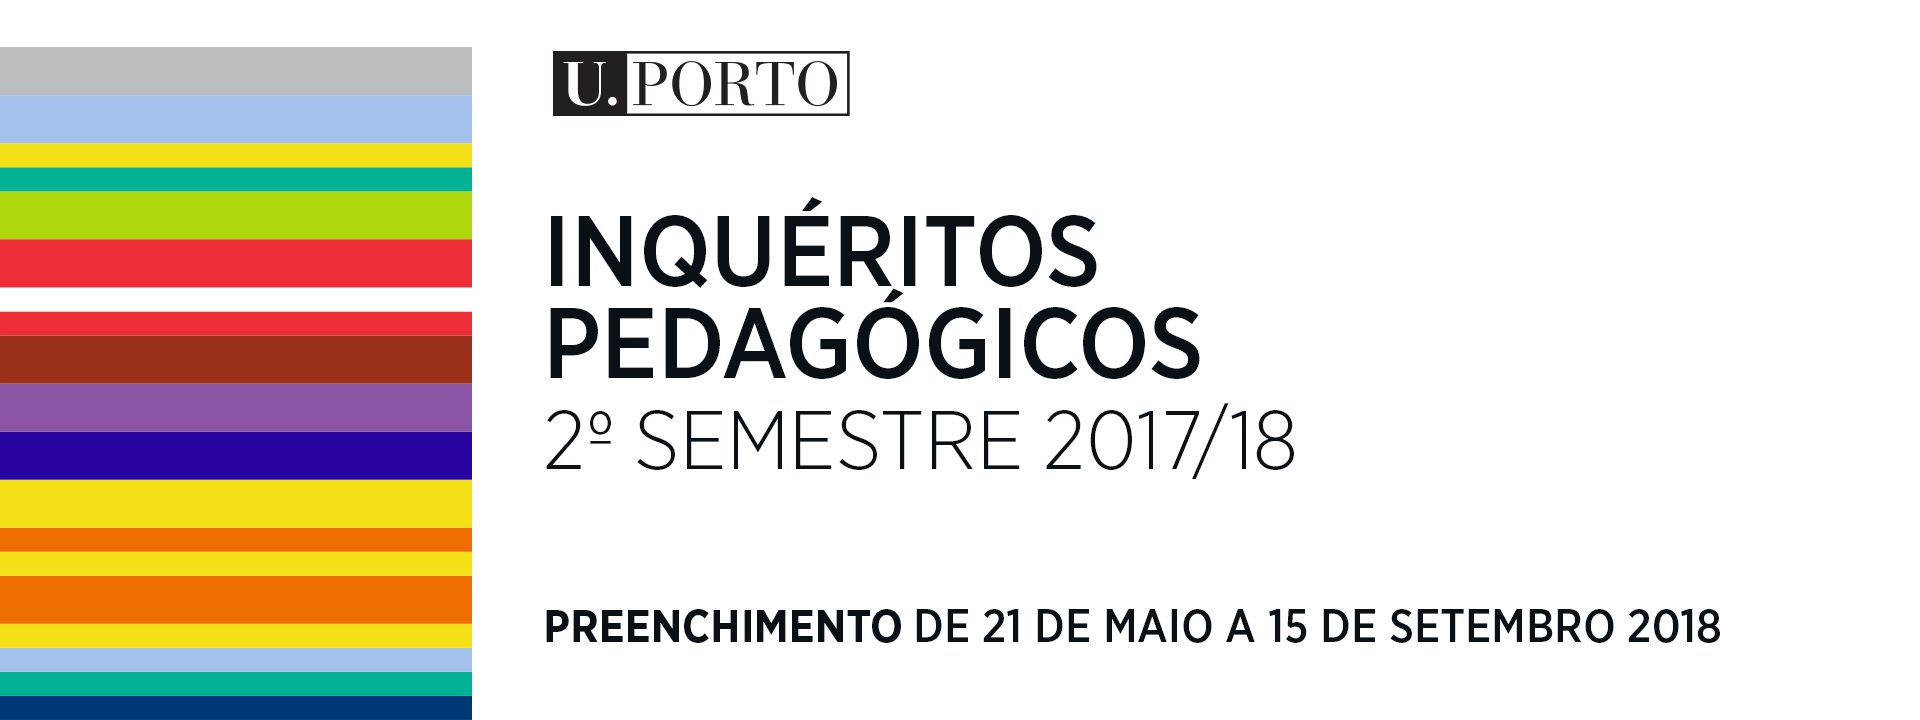 Prrenchimento IPUP – 2 semestre 2017-2018